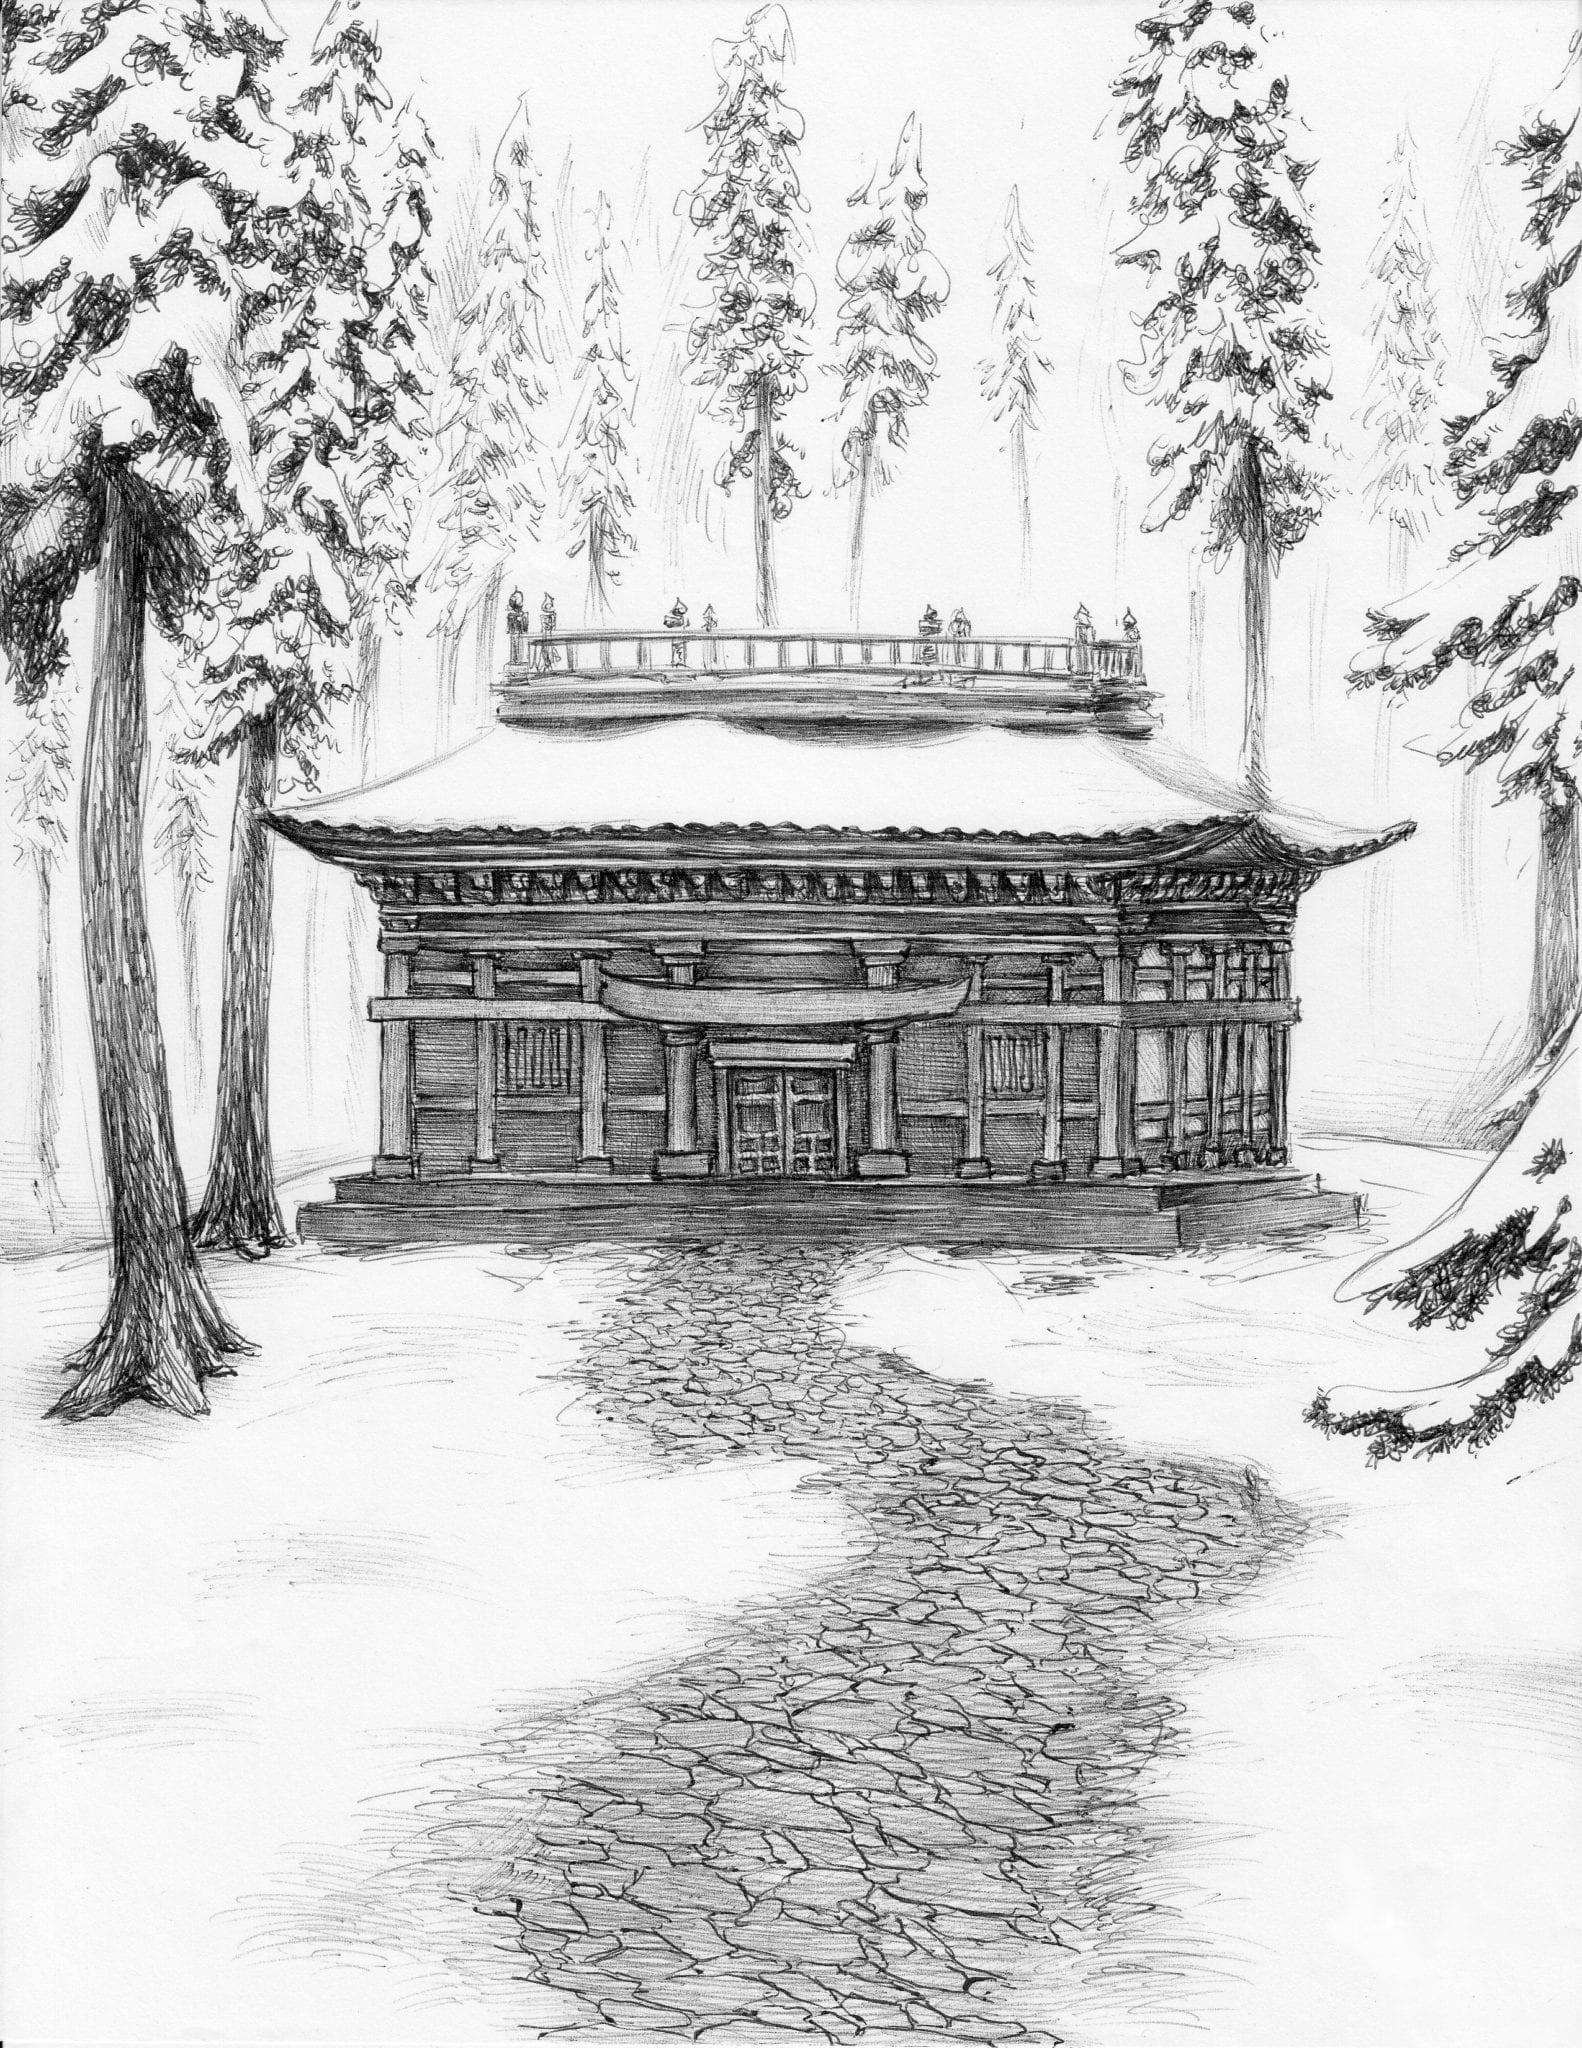 School in the Snow art by Dan Moran